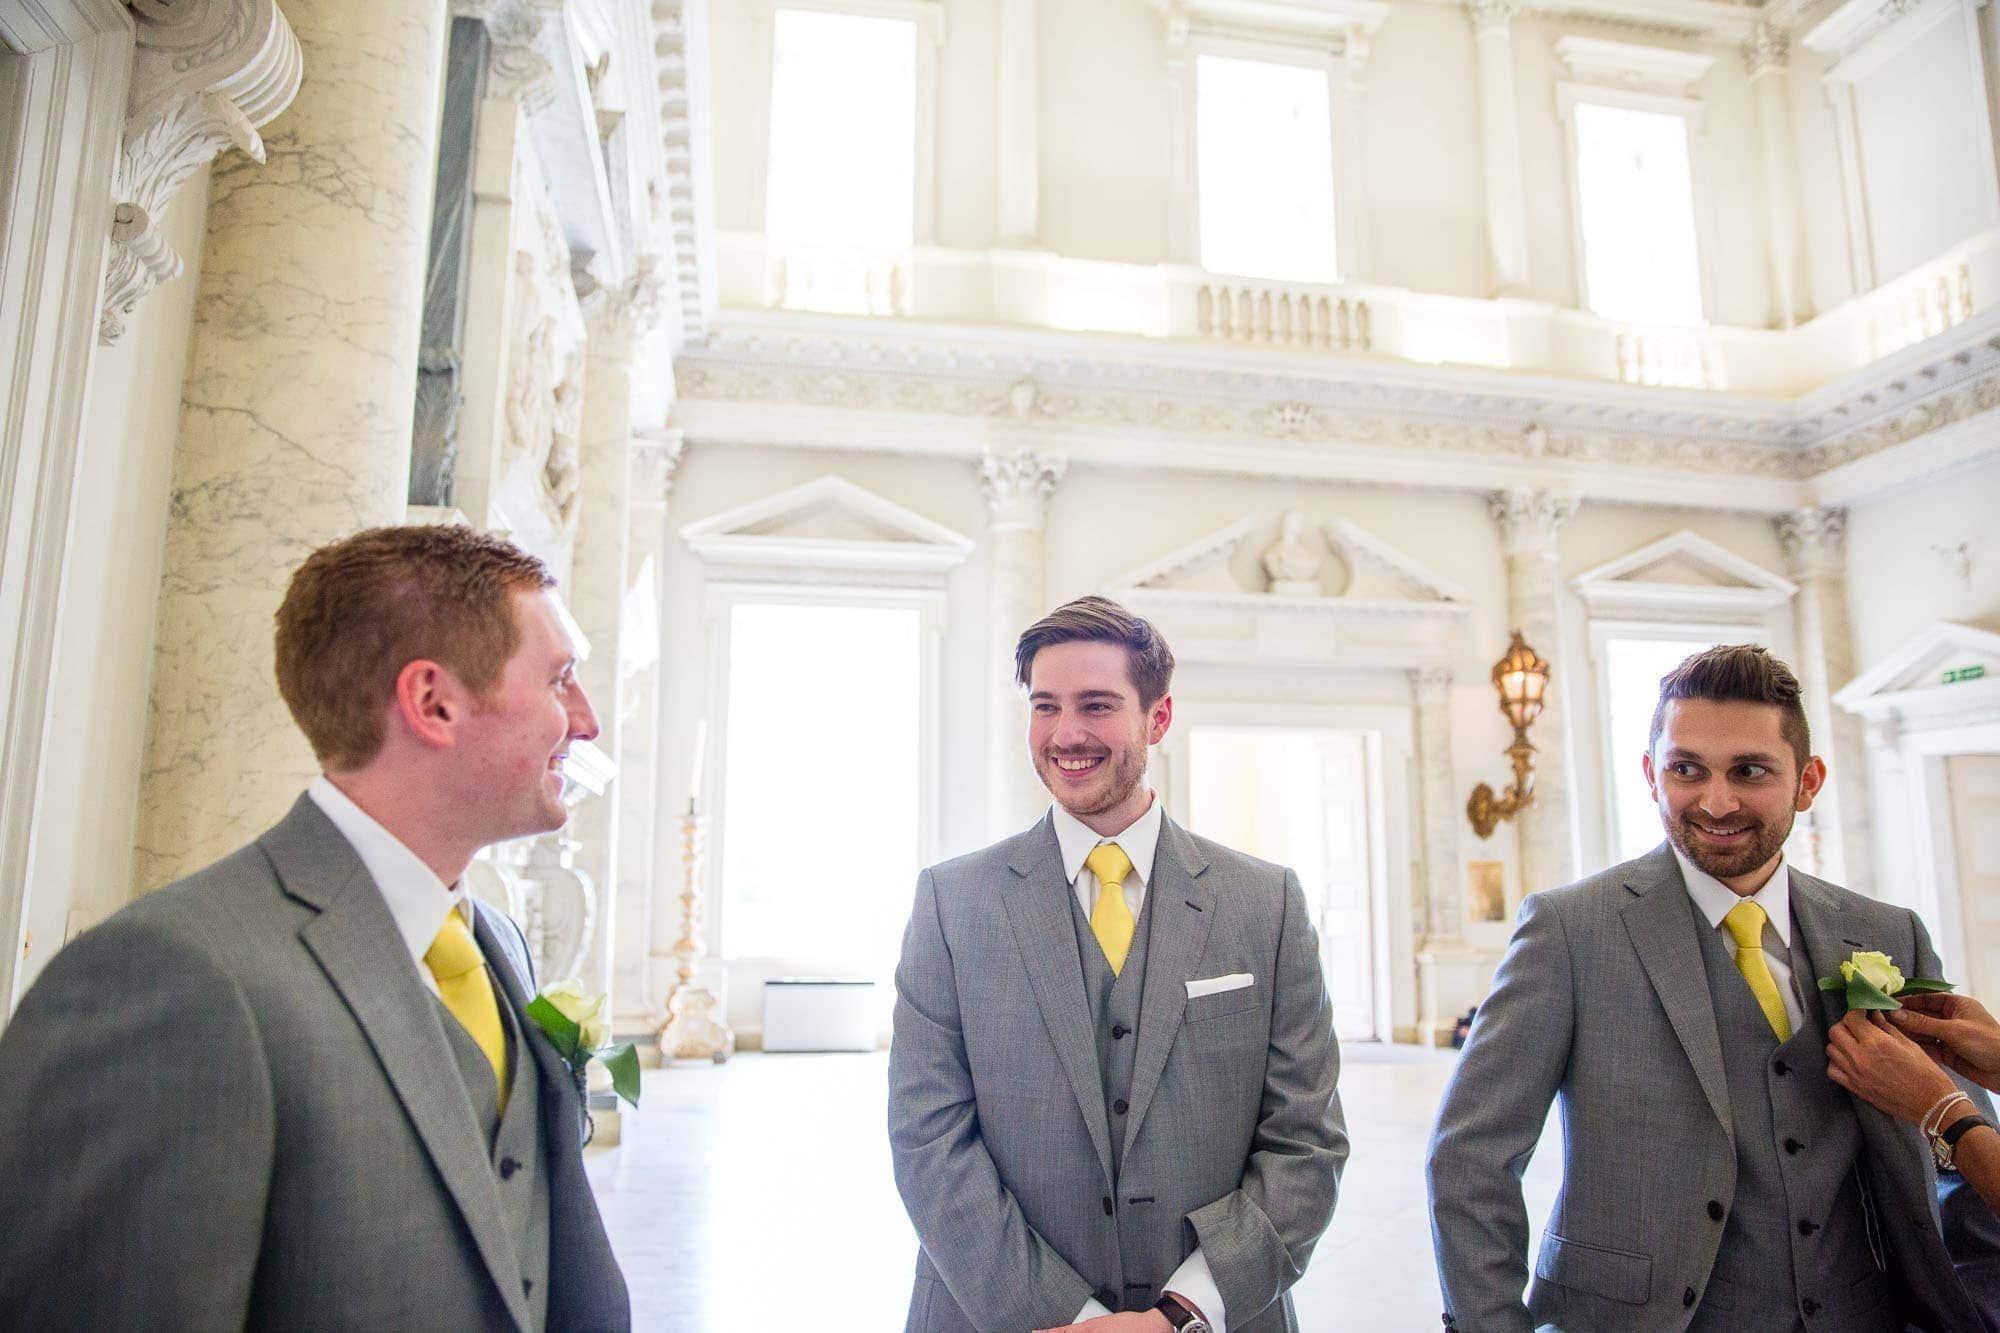 Clandon Park Wedding Photographer 16 5115